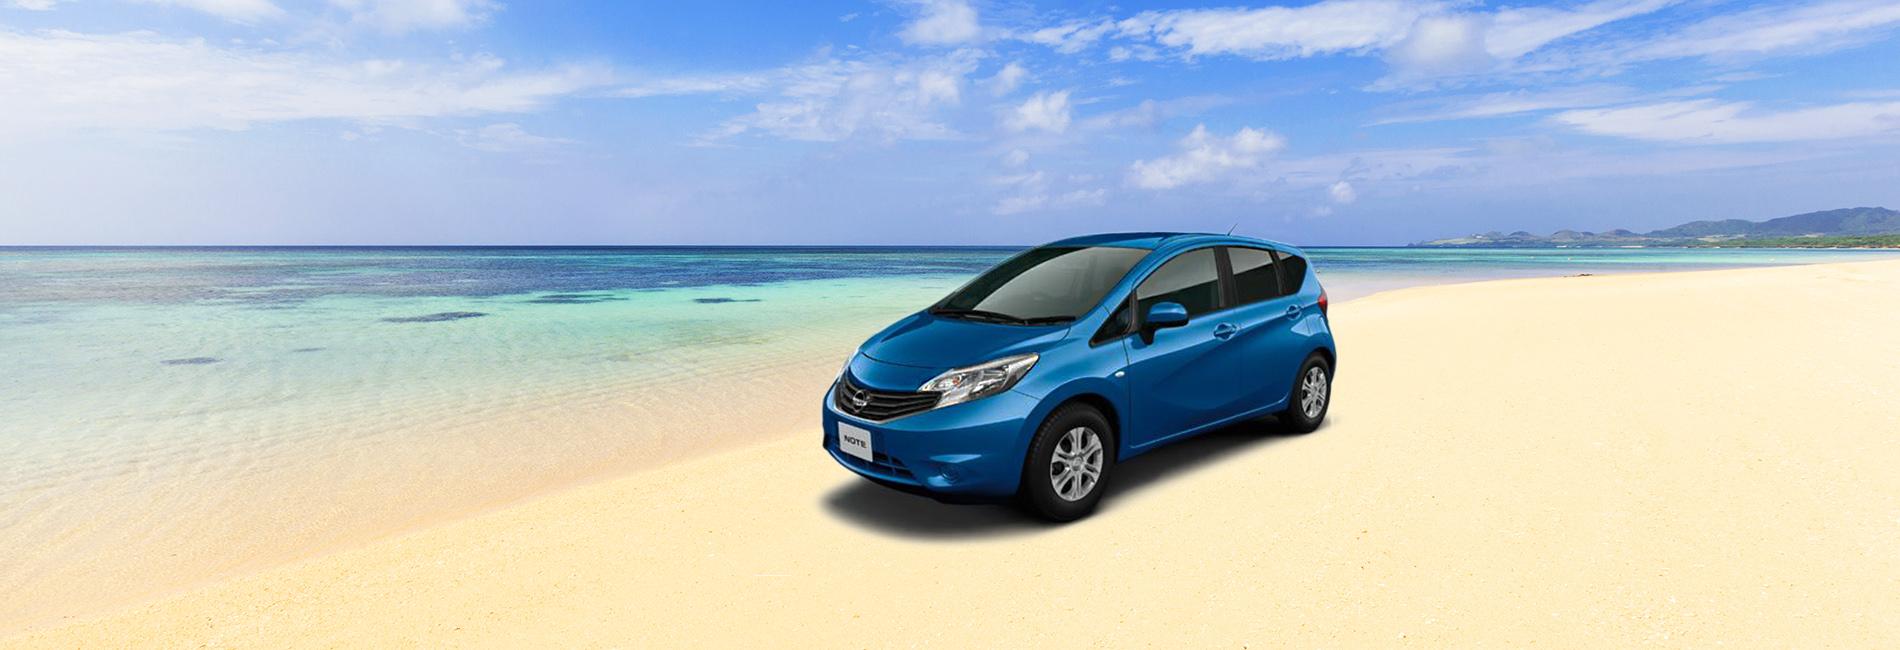 Ishigaki Island and Miyako Island Car Rental (C2 5-seater) - KKday